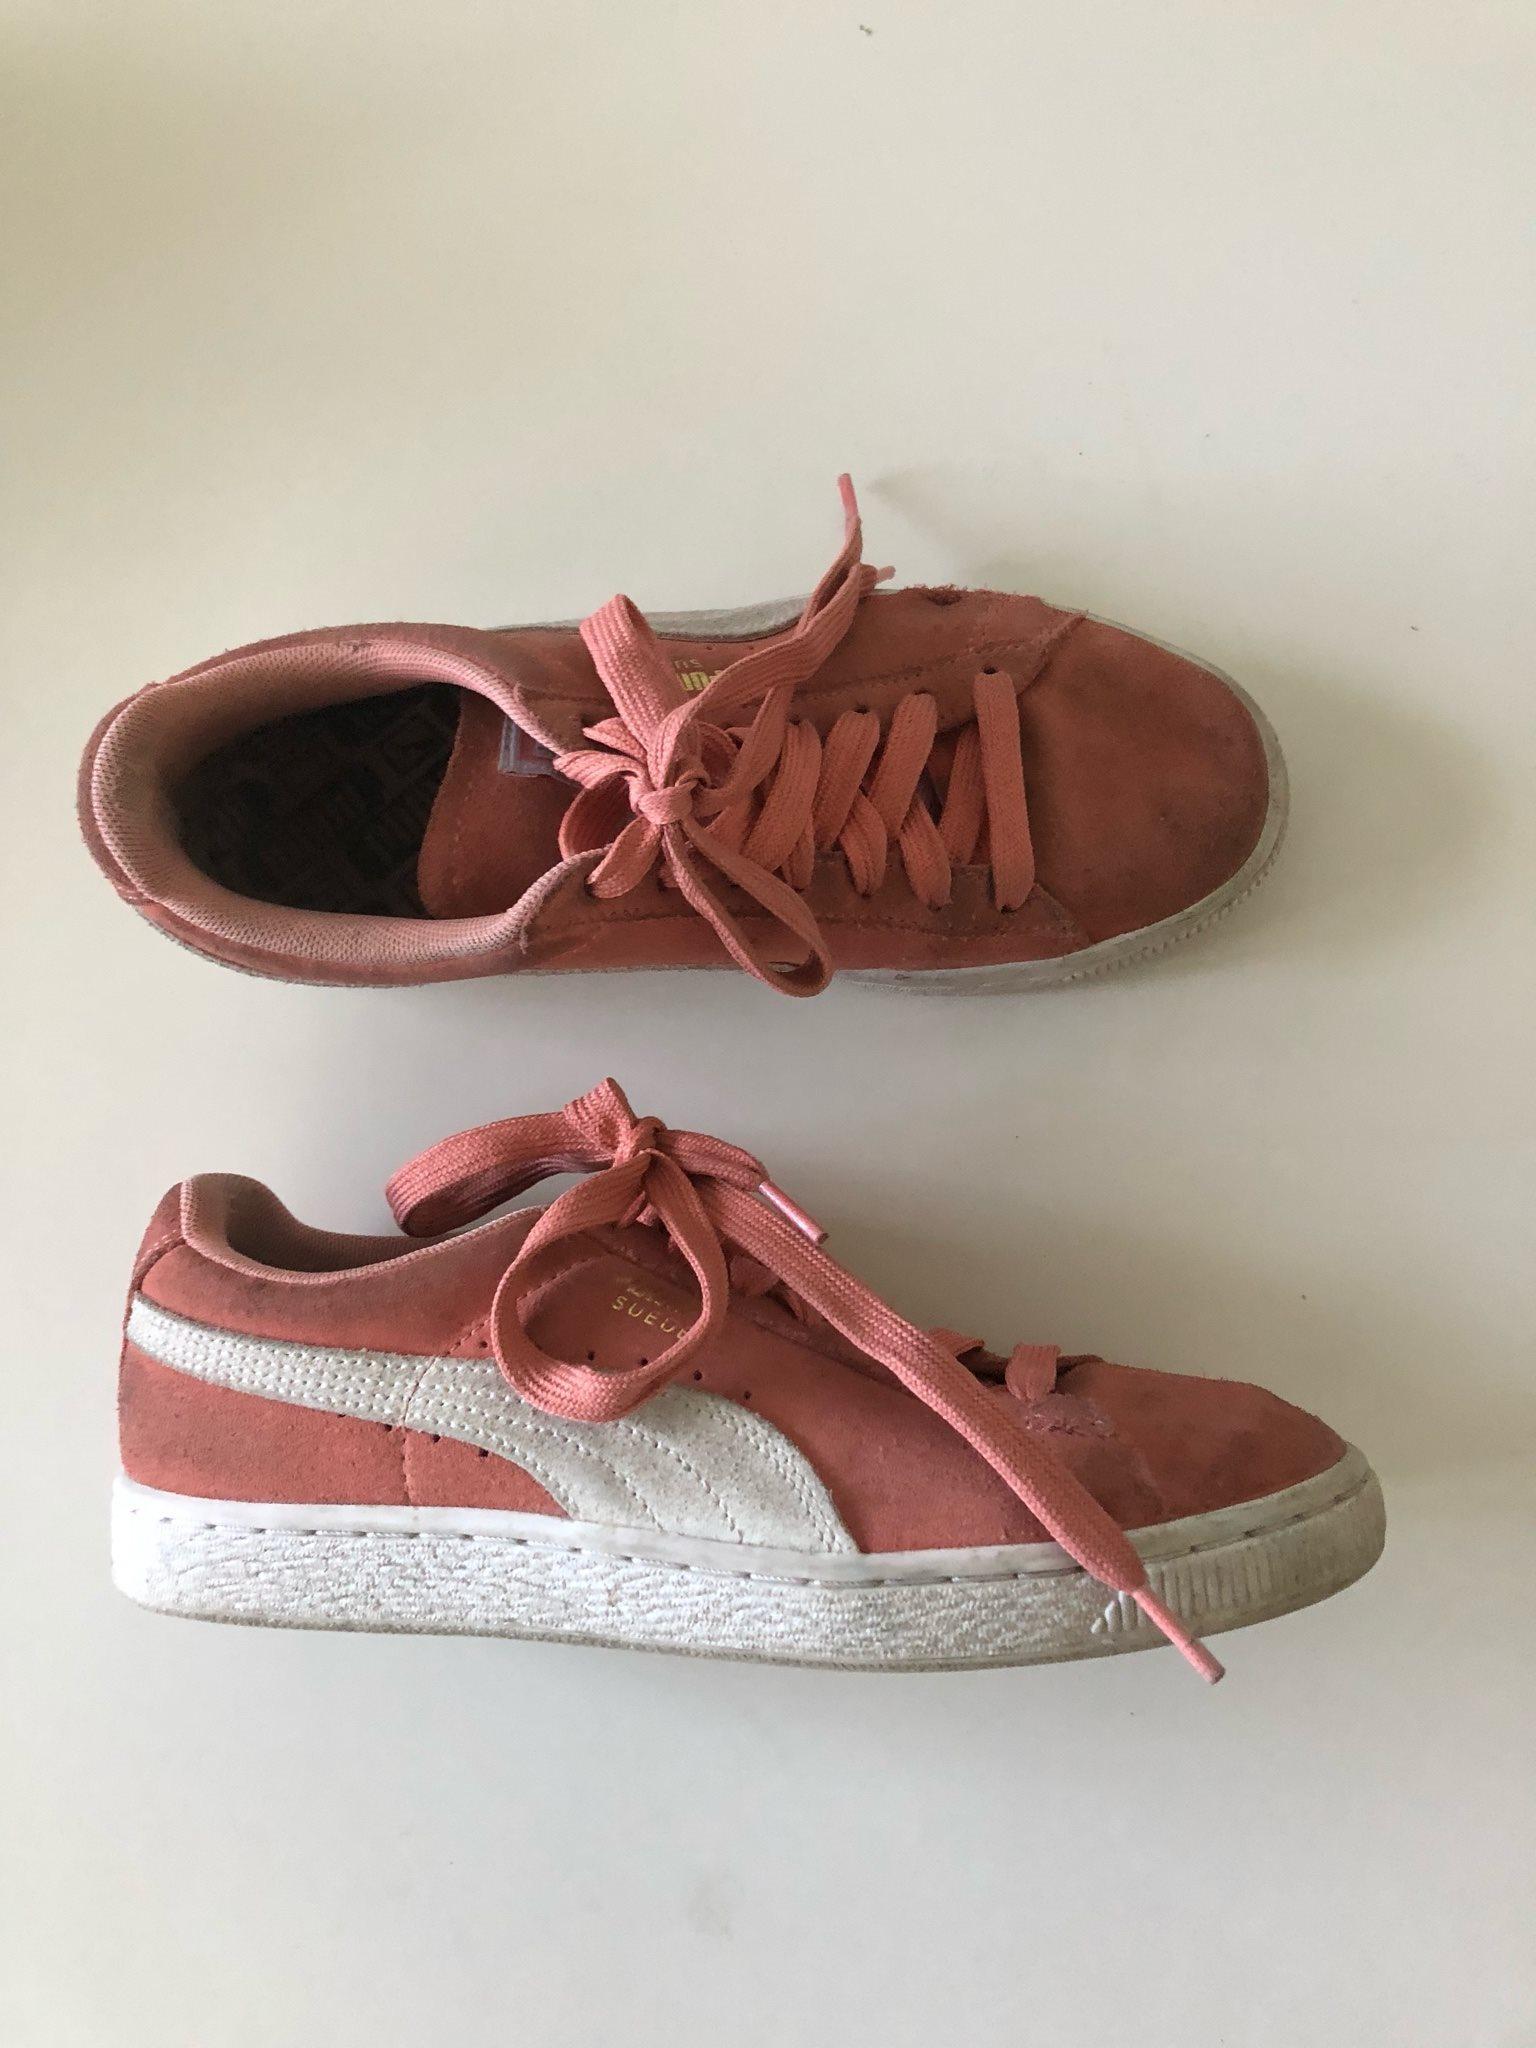 c5cdaf1f96e Puma skor stl 38 sneakers rosa mocka suede (344175462) ᐈ Köp på Tradera